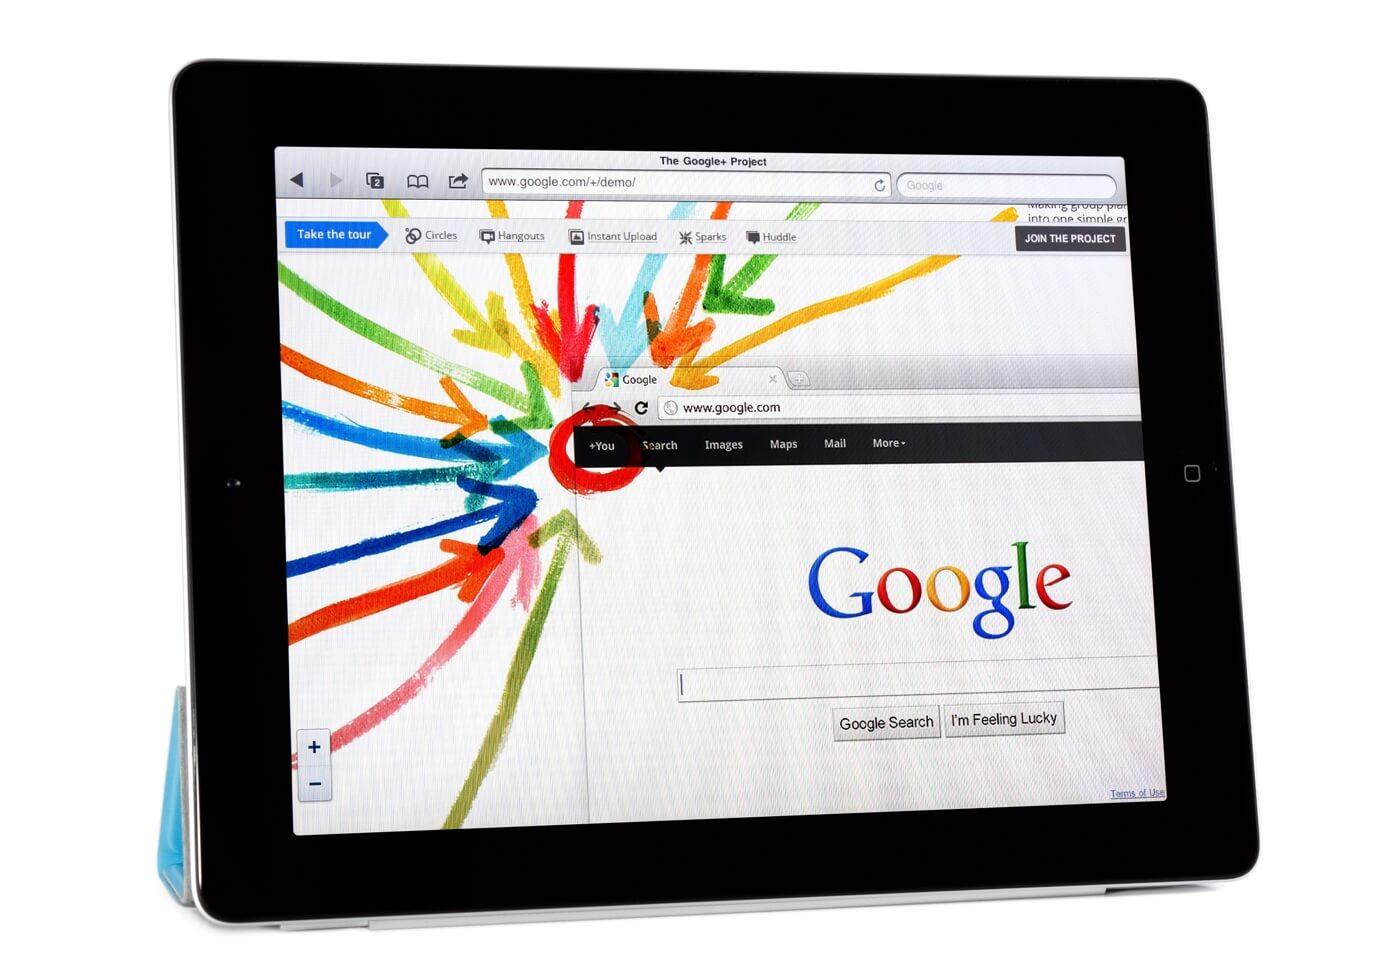 Opbyg relationer med Google+